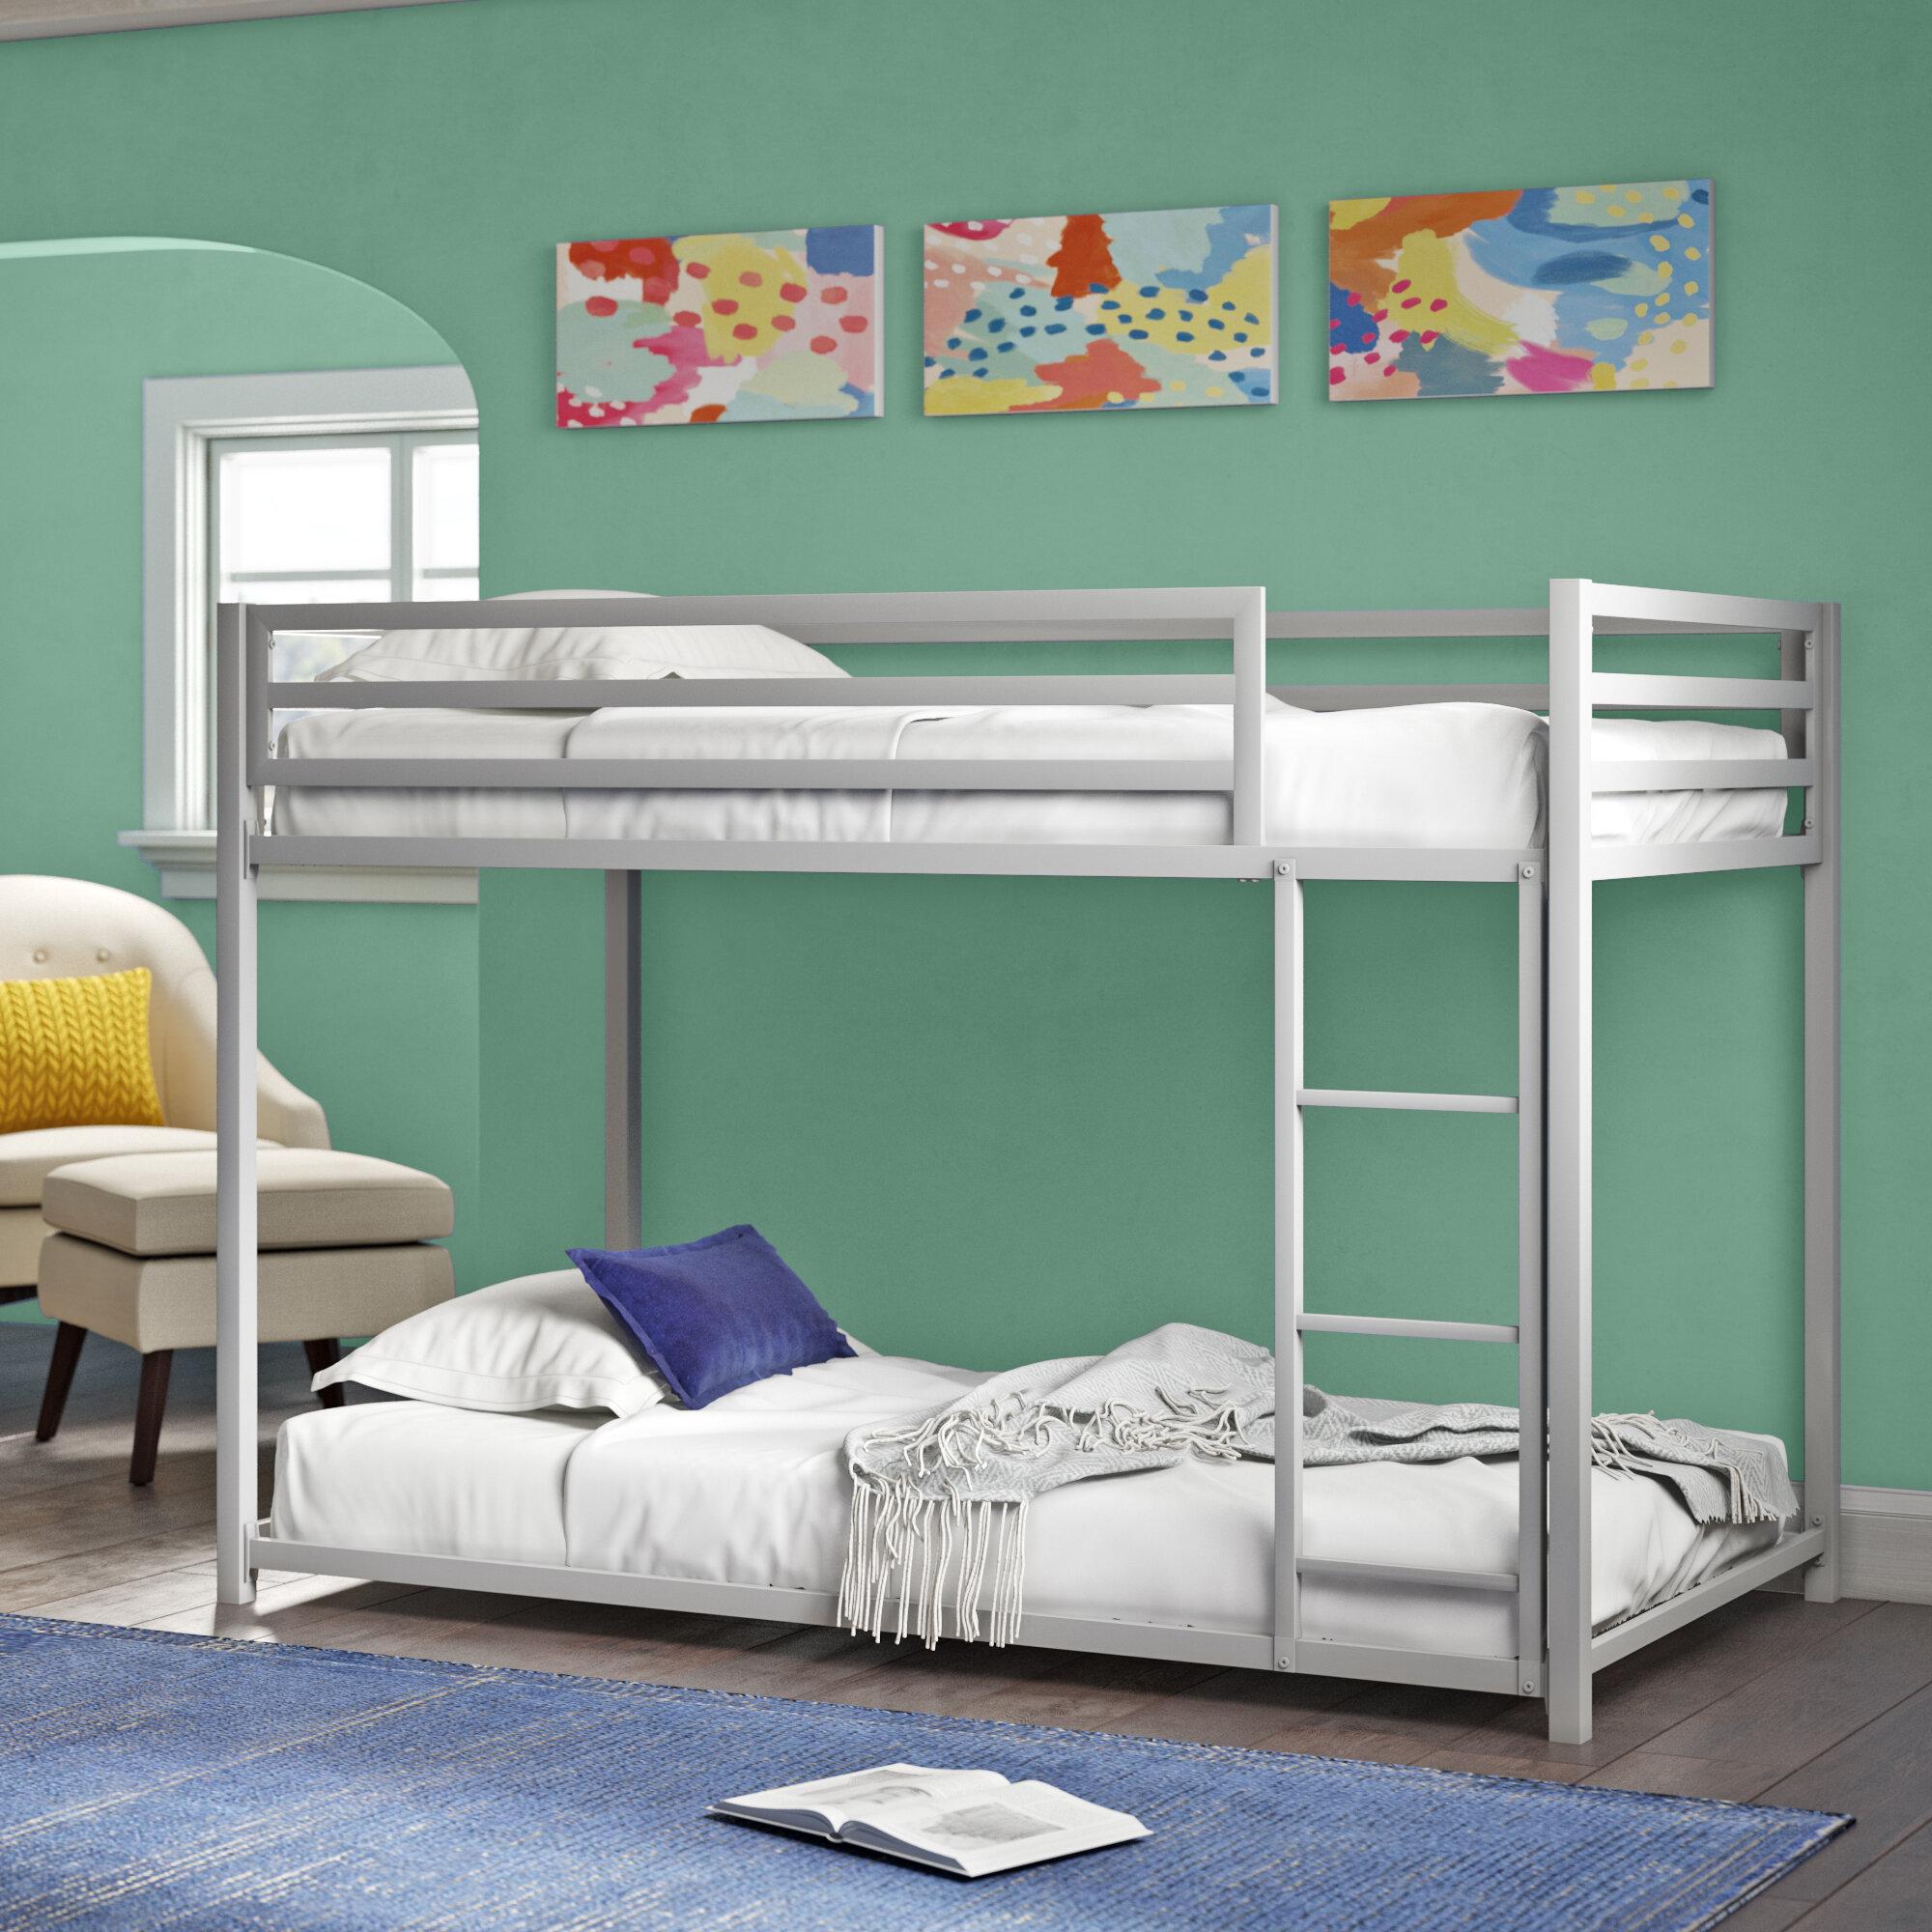 Wayfair Bunk Modern Contemporary Kids Beds You Ll Love In 2021